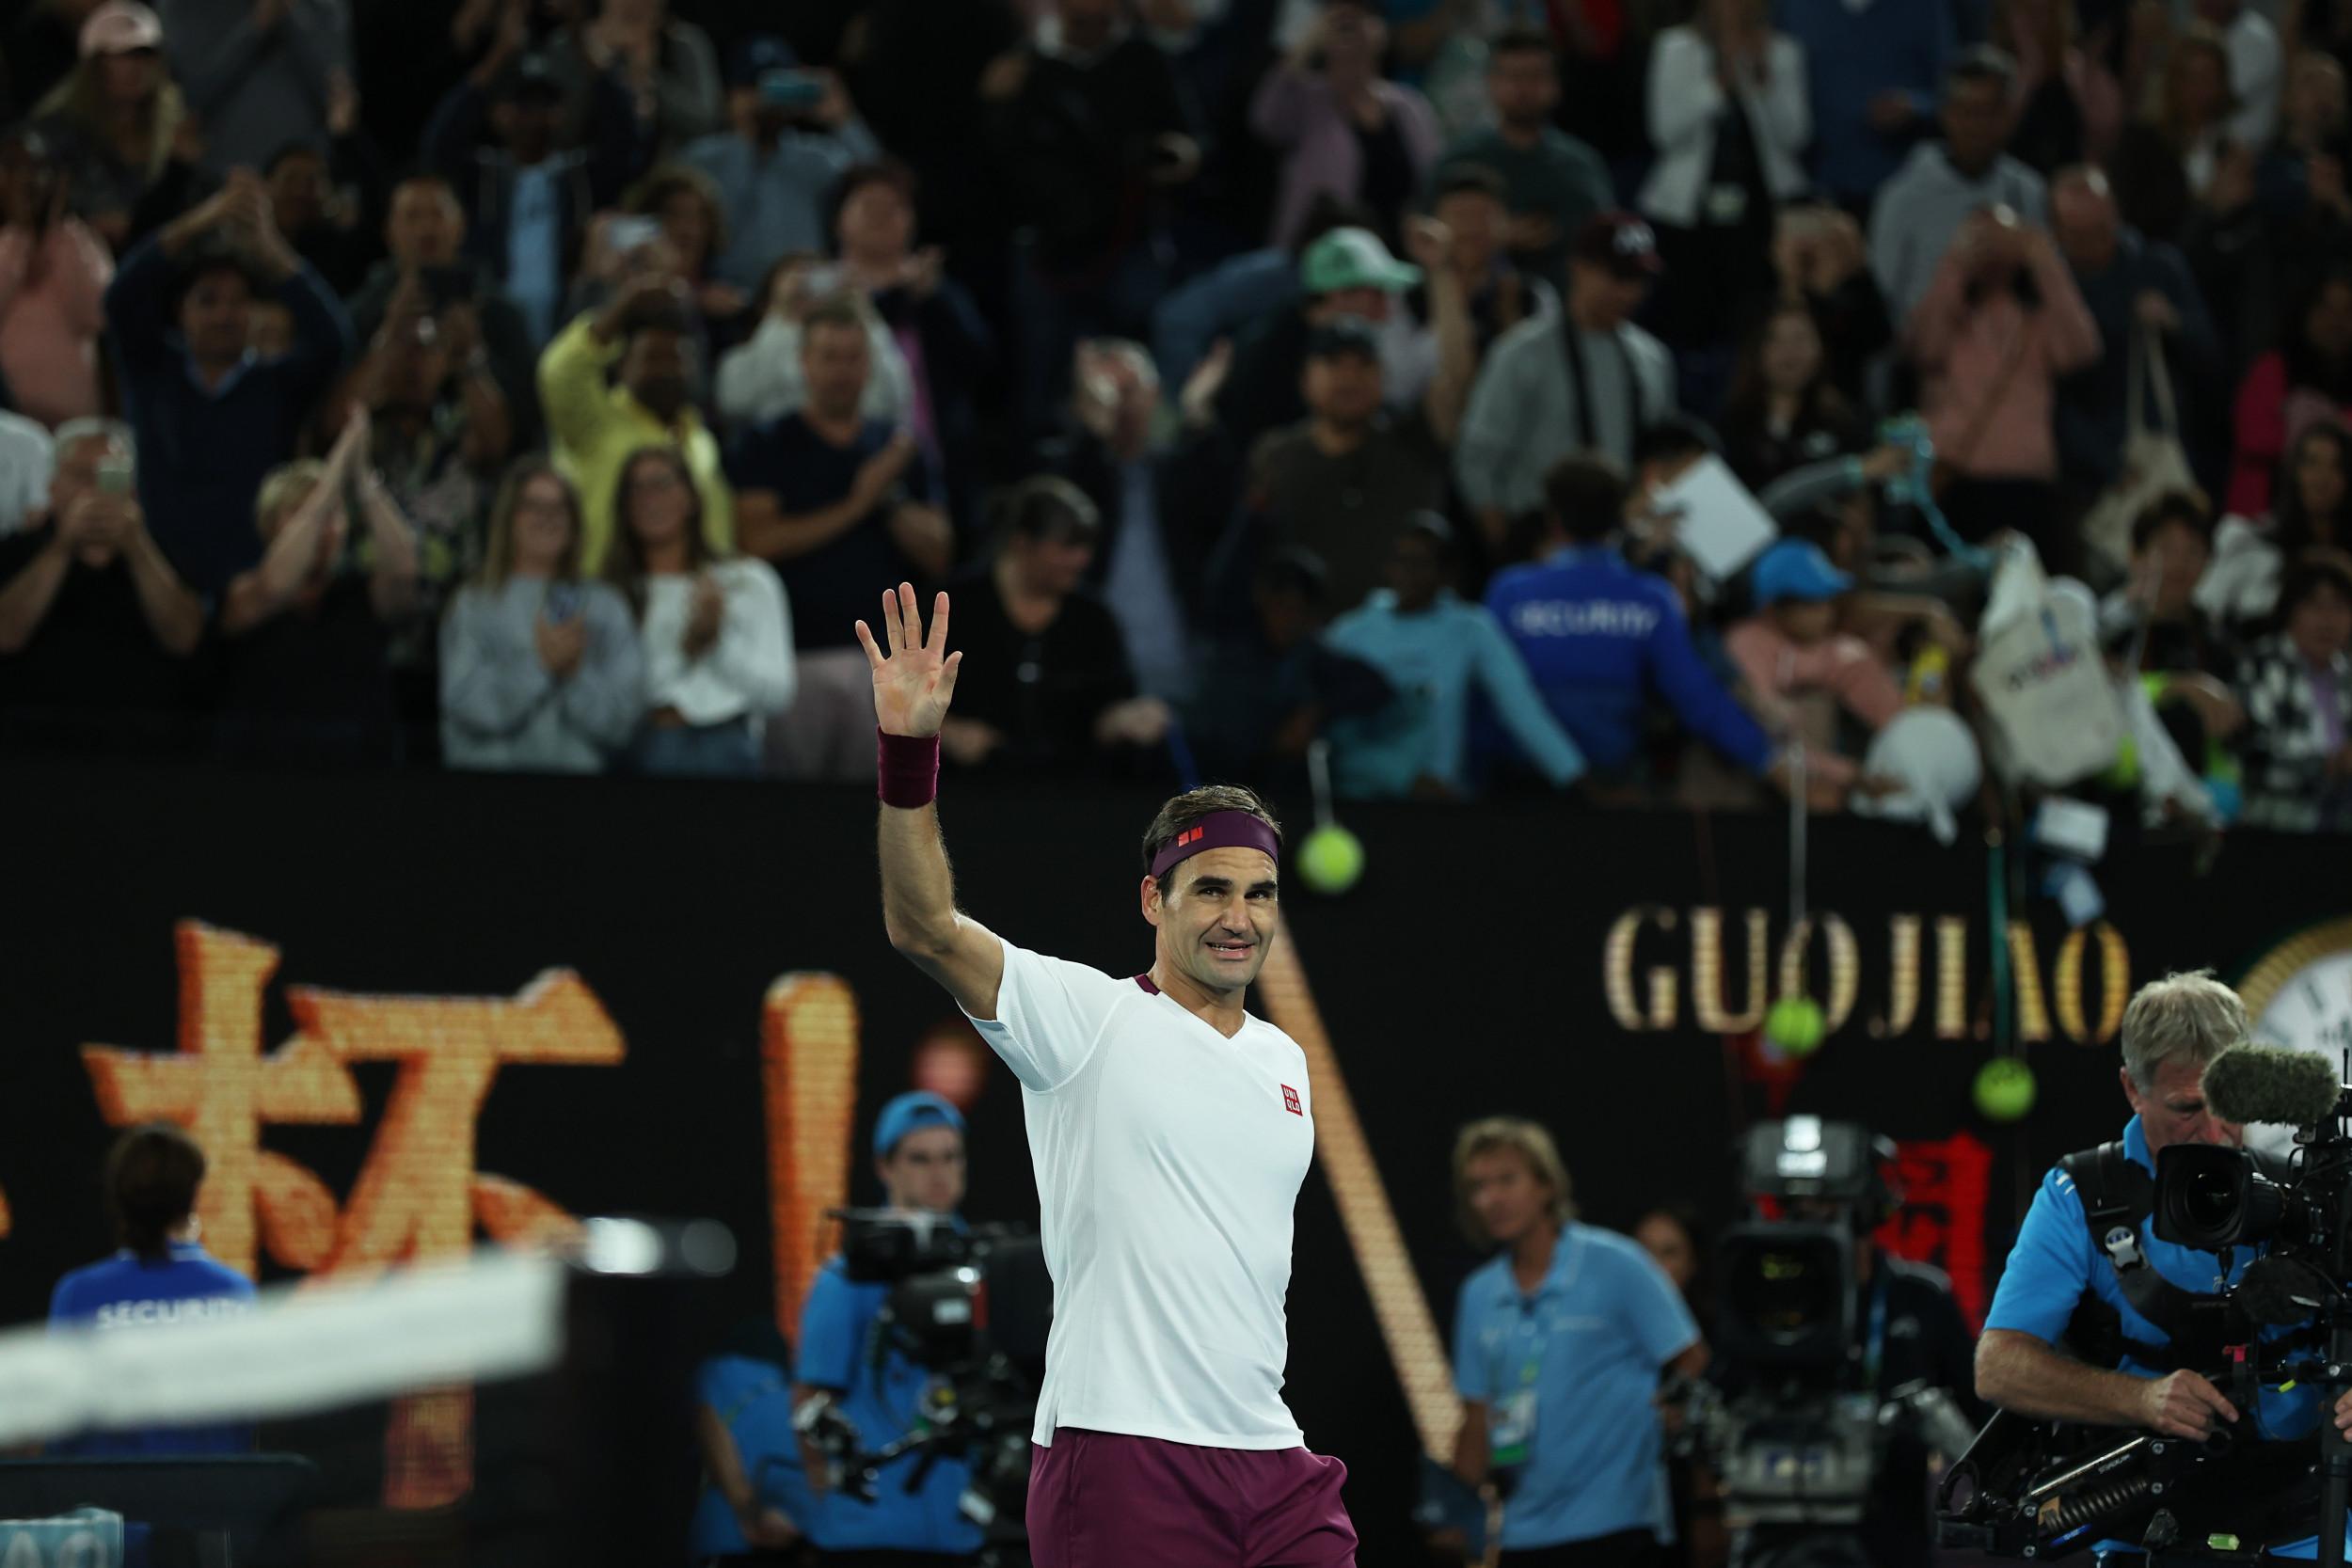 Australian Open 2020 Tv Schedule Where To Watch Roger Federer Novak Djokovic Quarterfinal Matches Start Time Live Stream